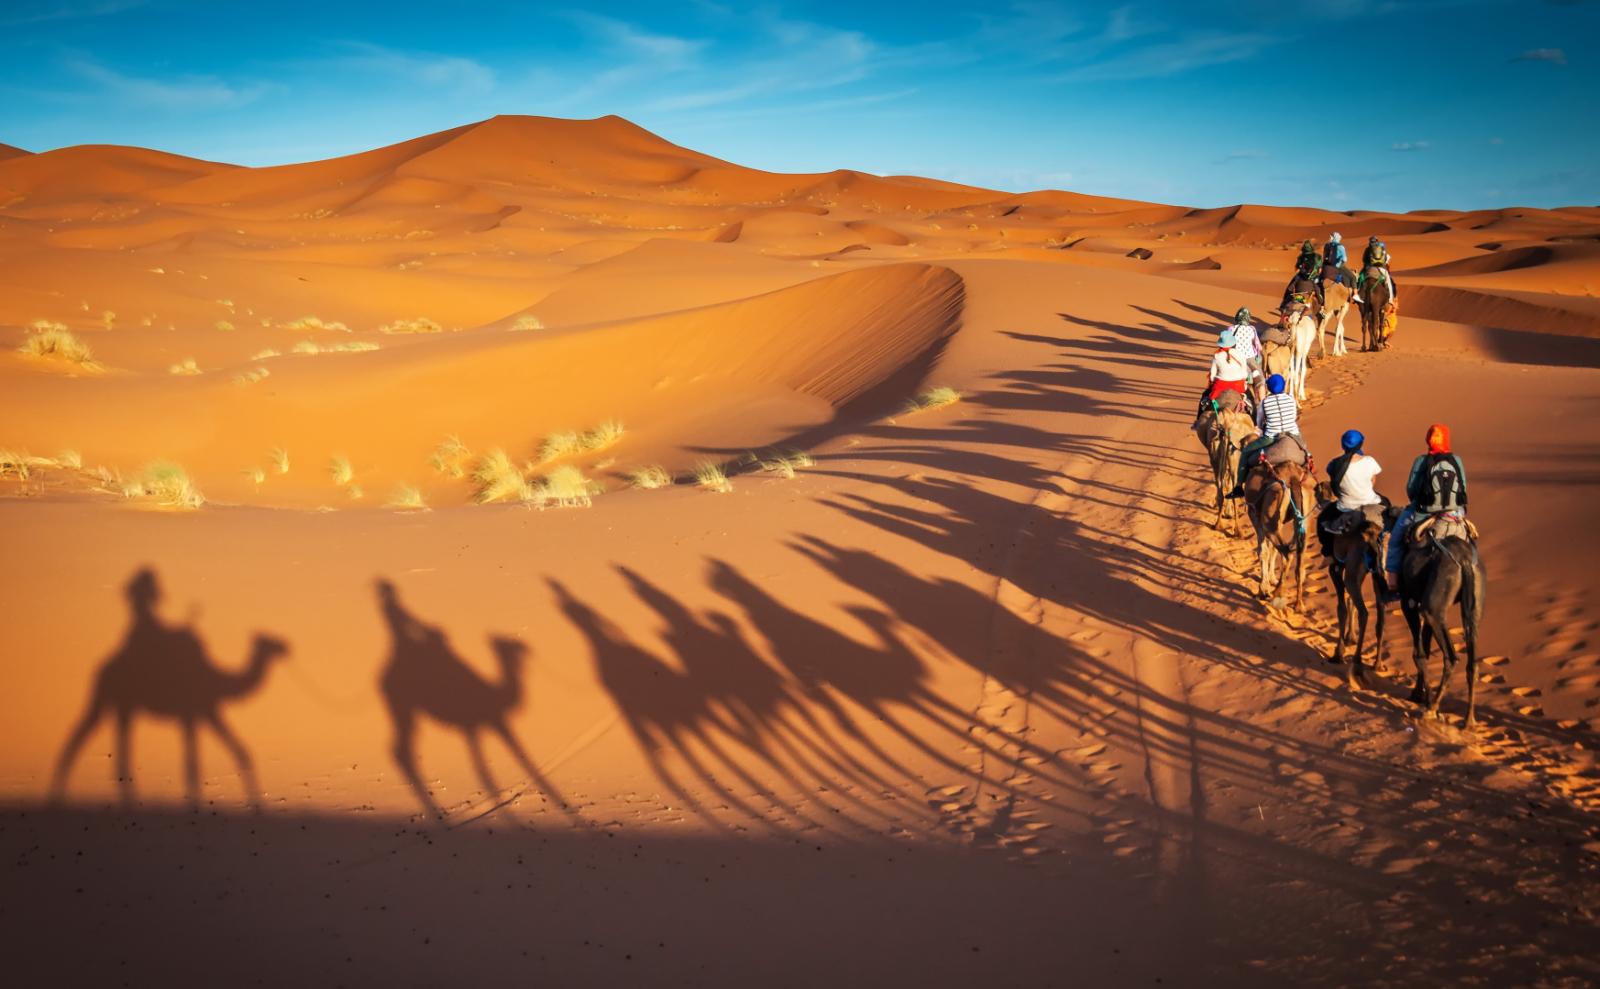 a line of camels walks across the desert